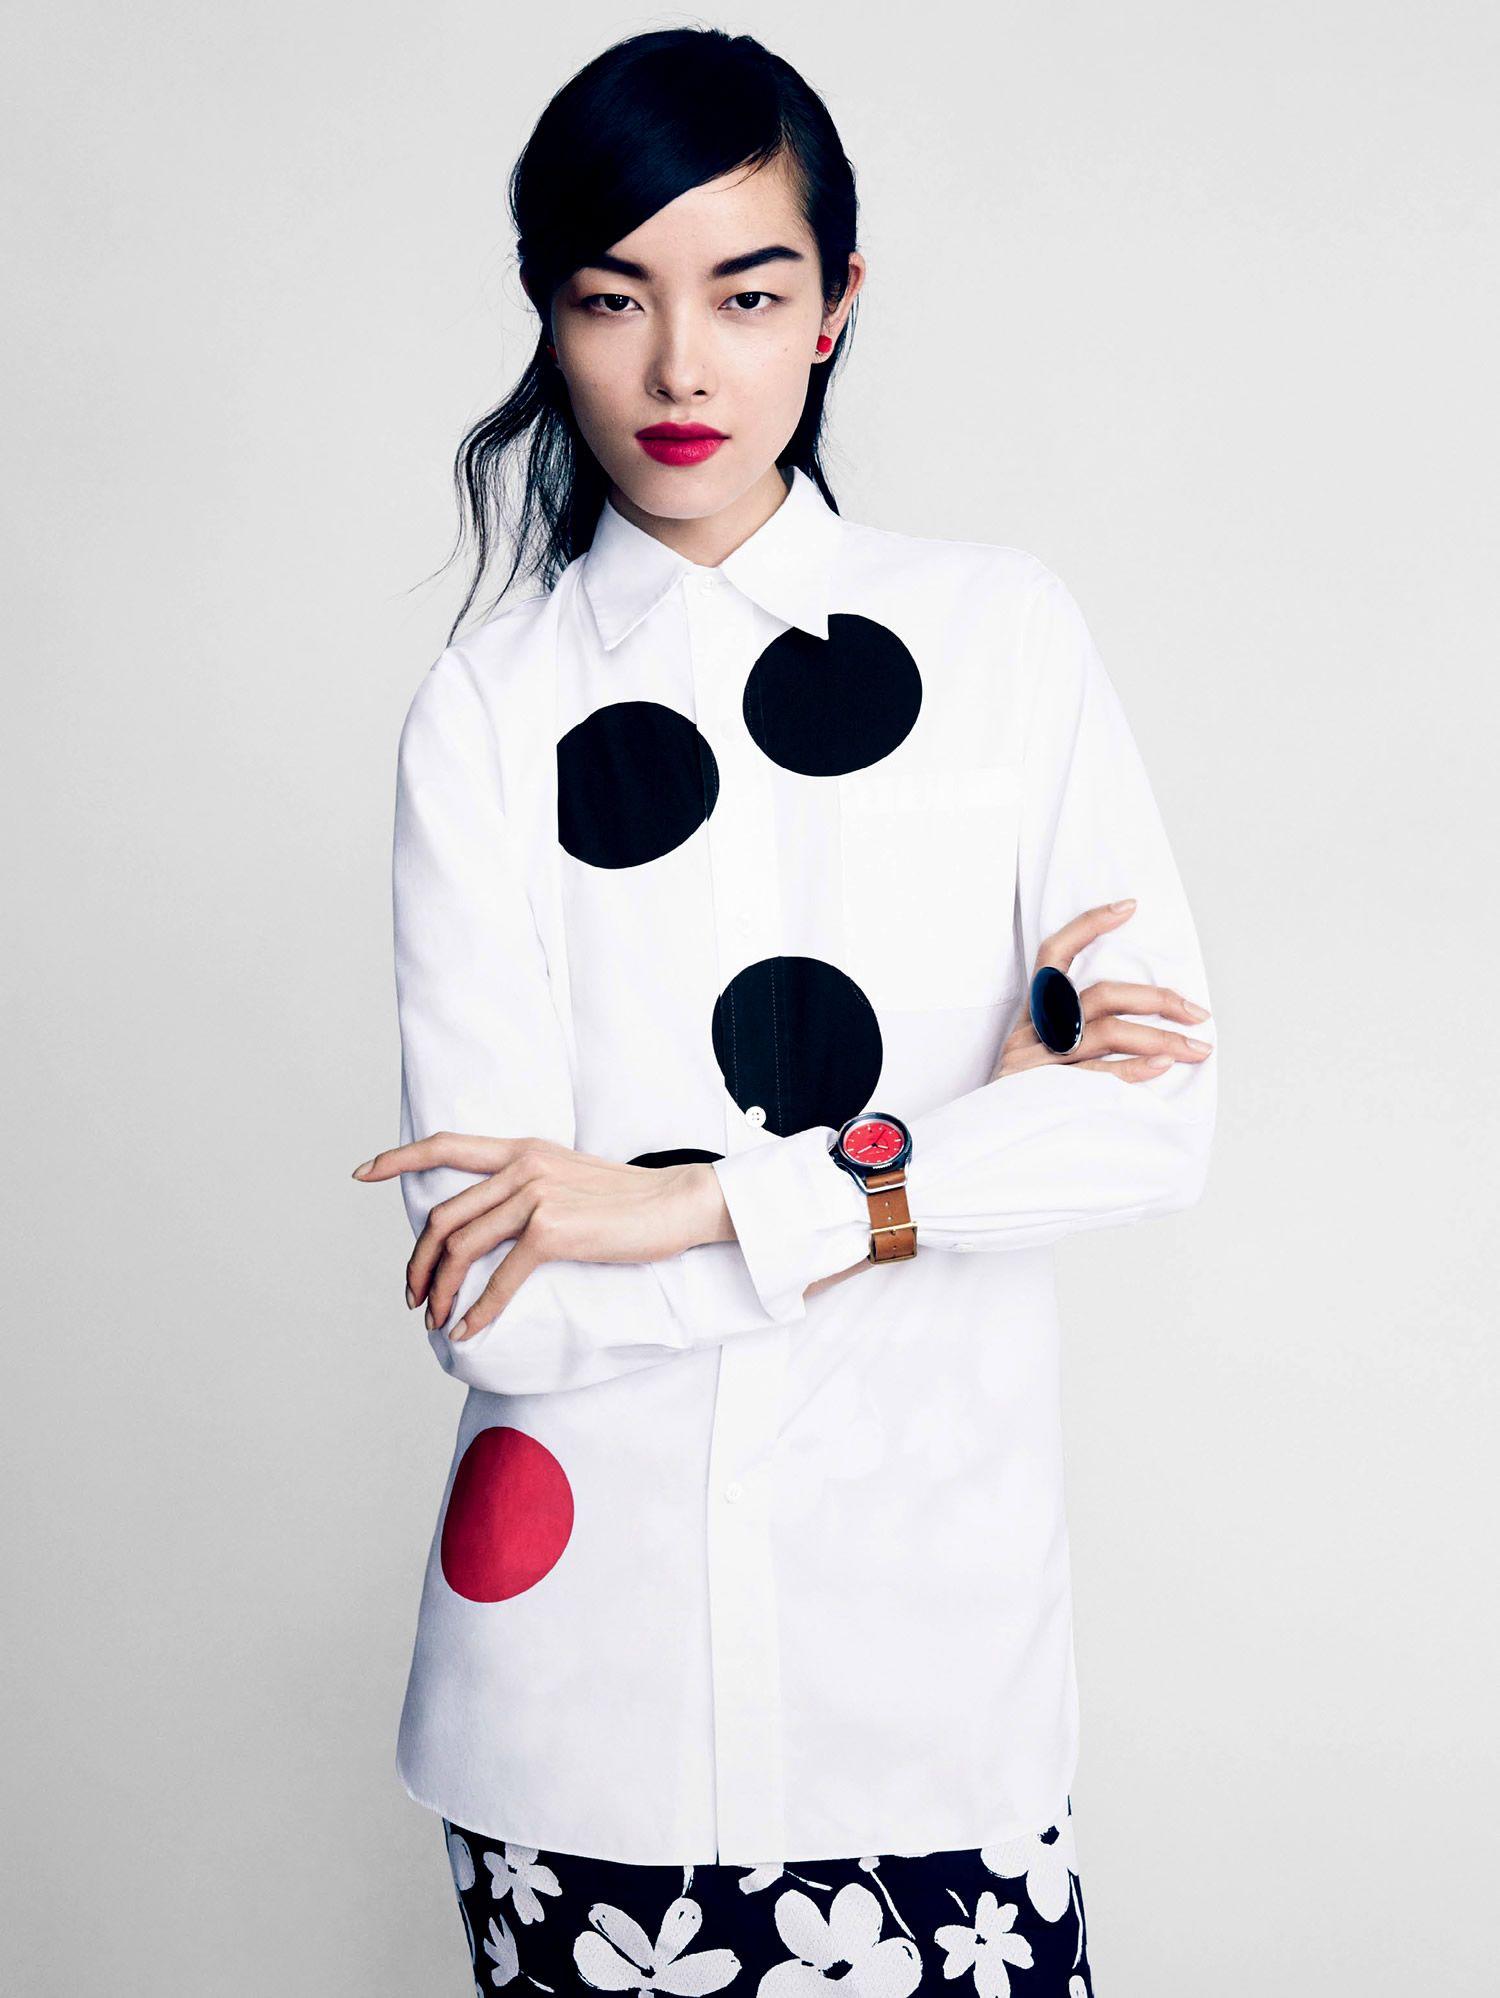 Top Form I US Vogue I February 2014 I Models: Sun Feifei, Sasha Pivovarova, Anais Mali I Photographer: Patrick Demarchelier I Editor: Sara Moonves.